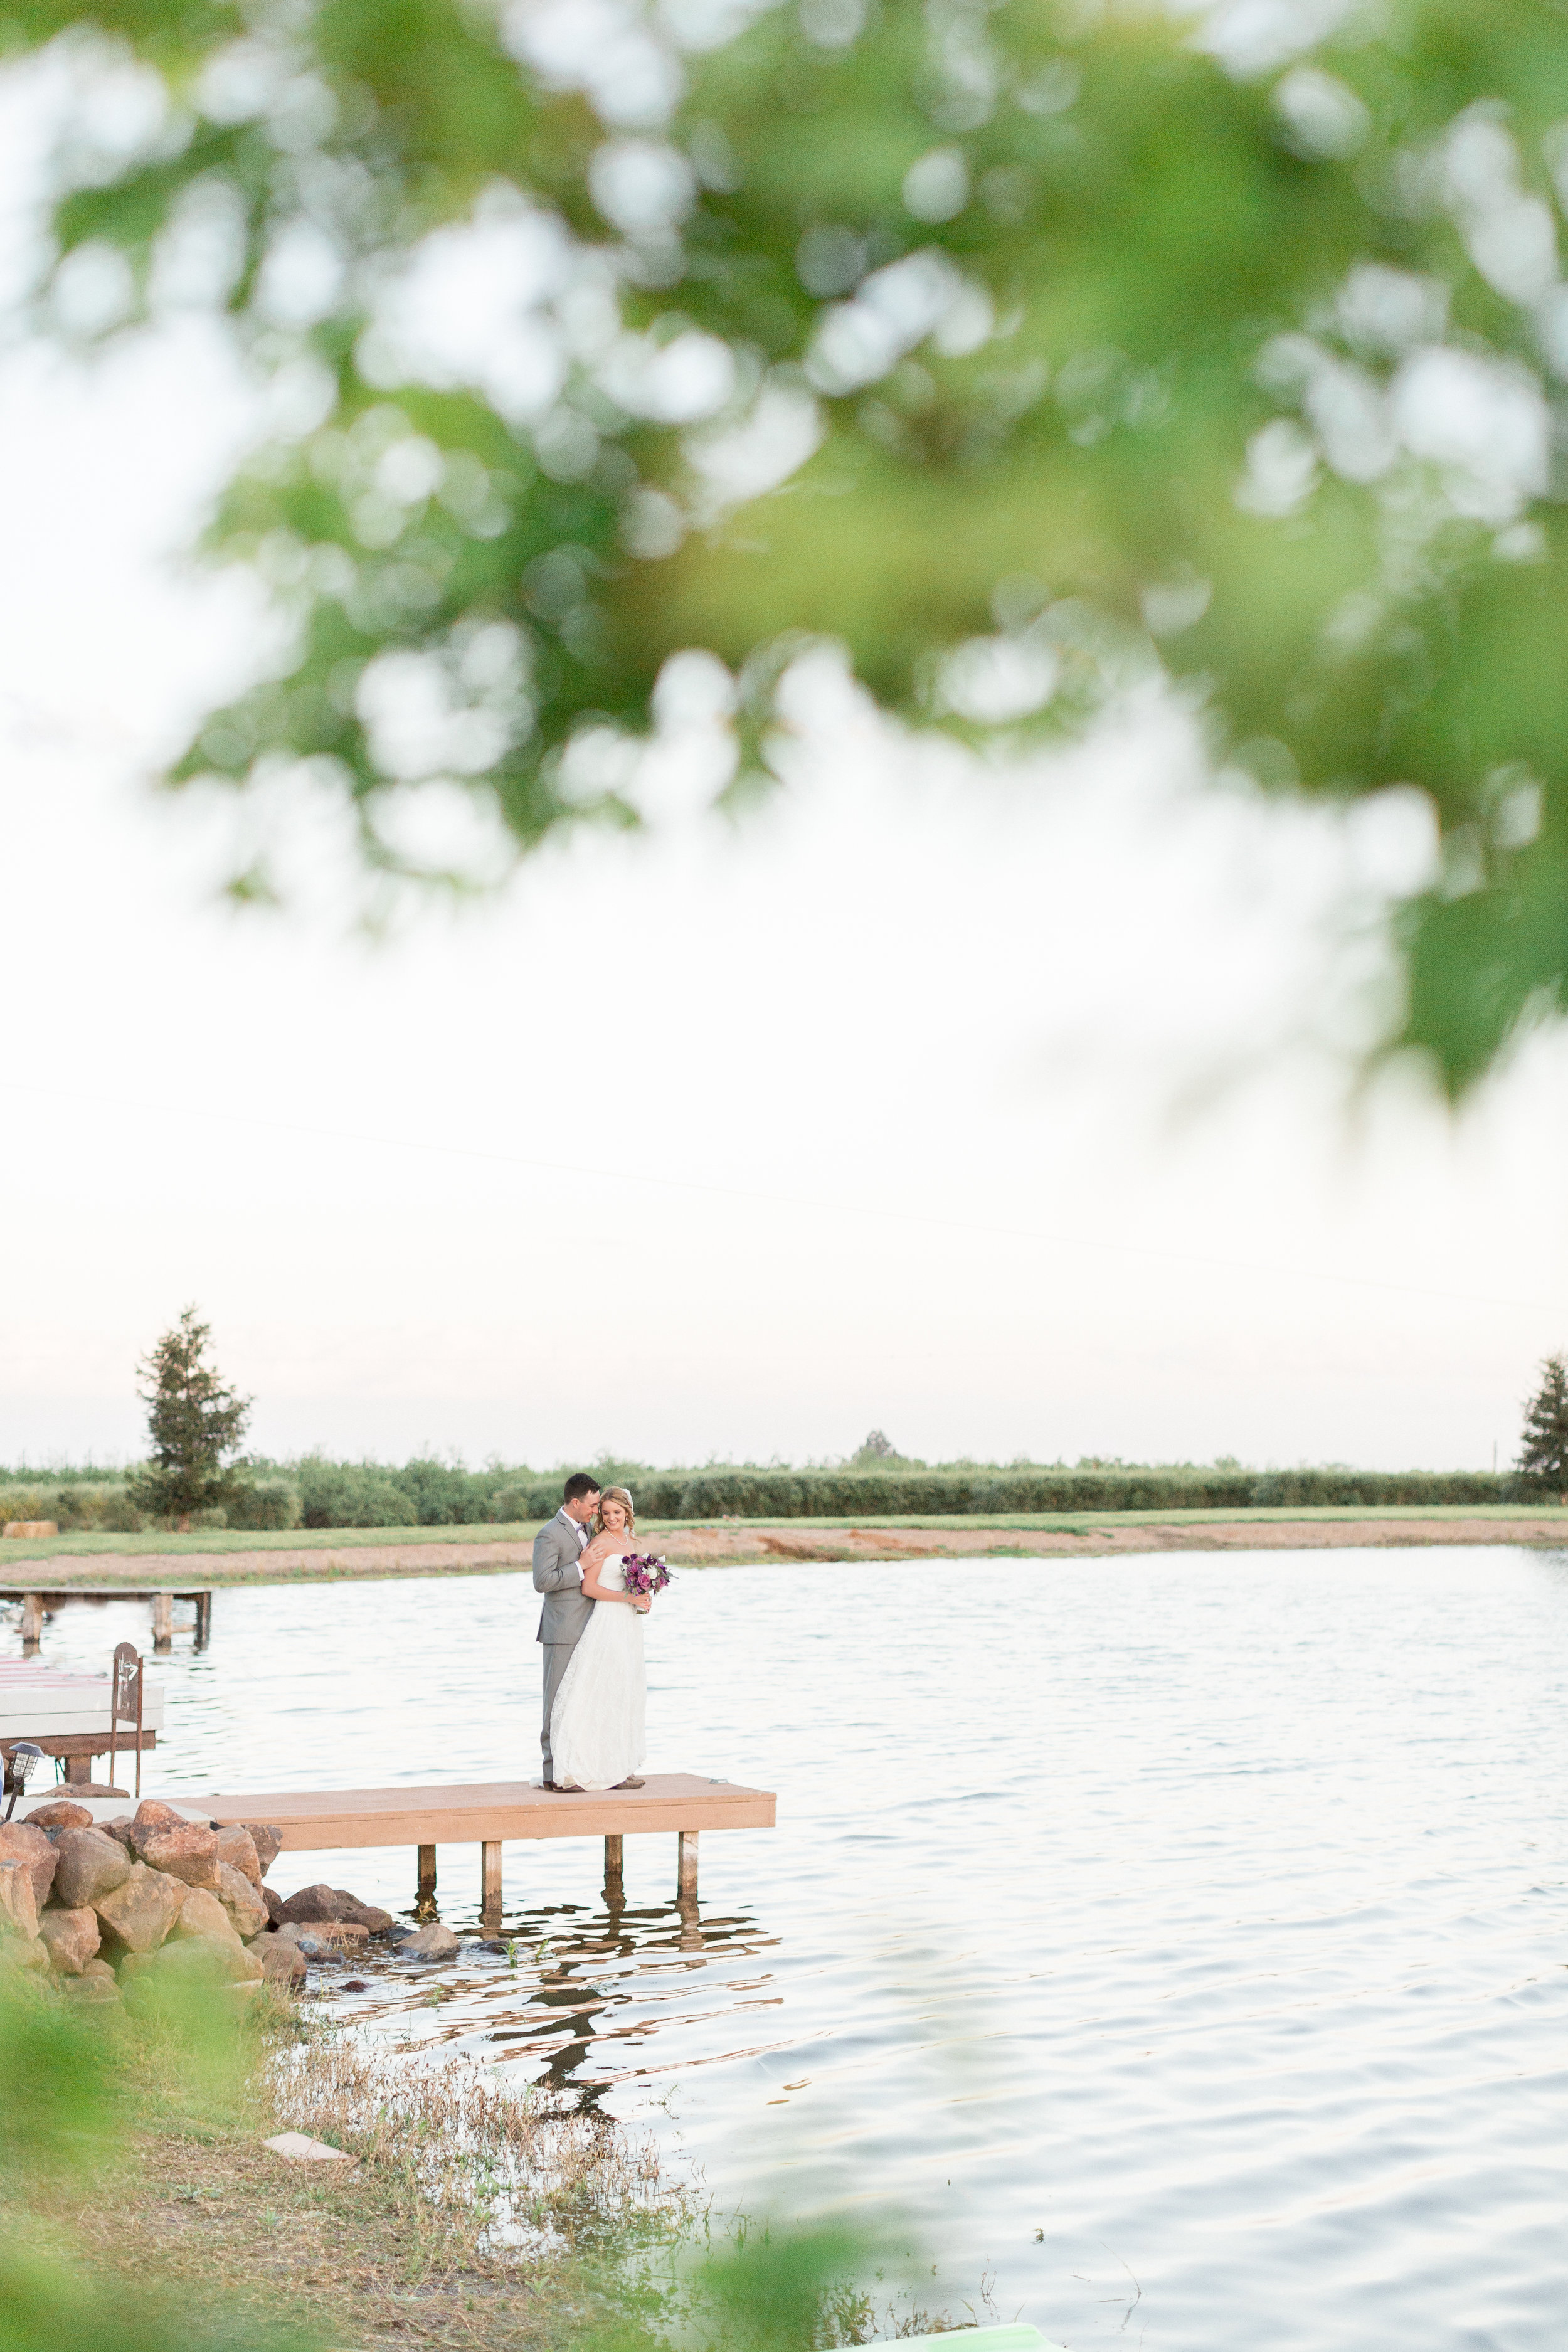 red-rock-lake-wedding-venue-orland-photography-tannerbridget-1.jpg